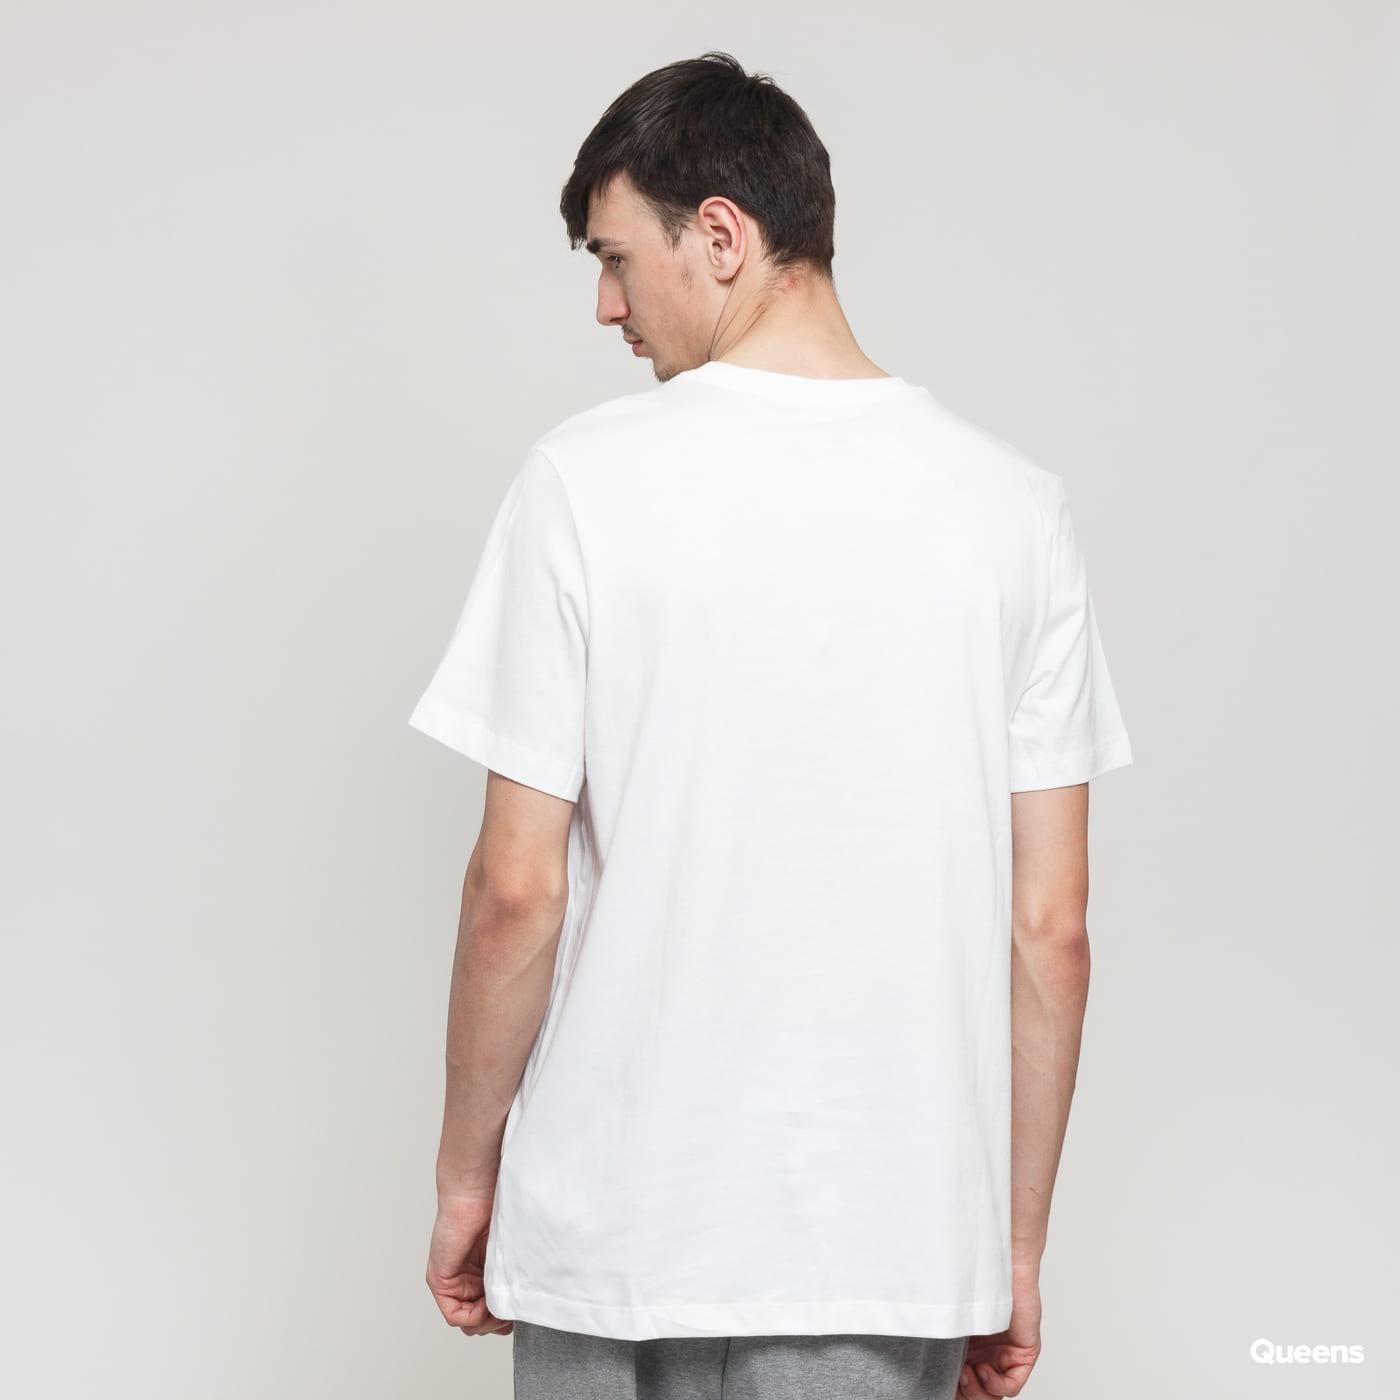 Nike M NSW Tee Swoosh BMPR STKR white